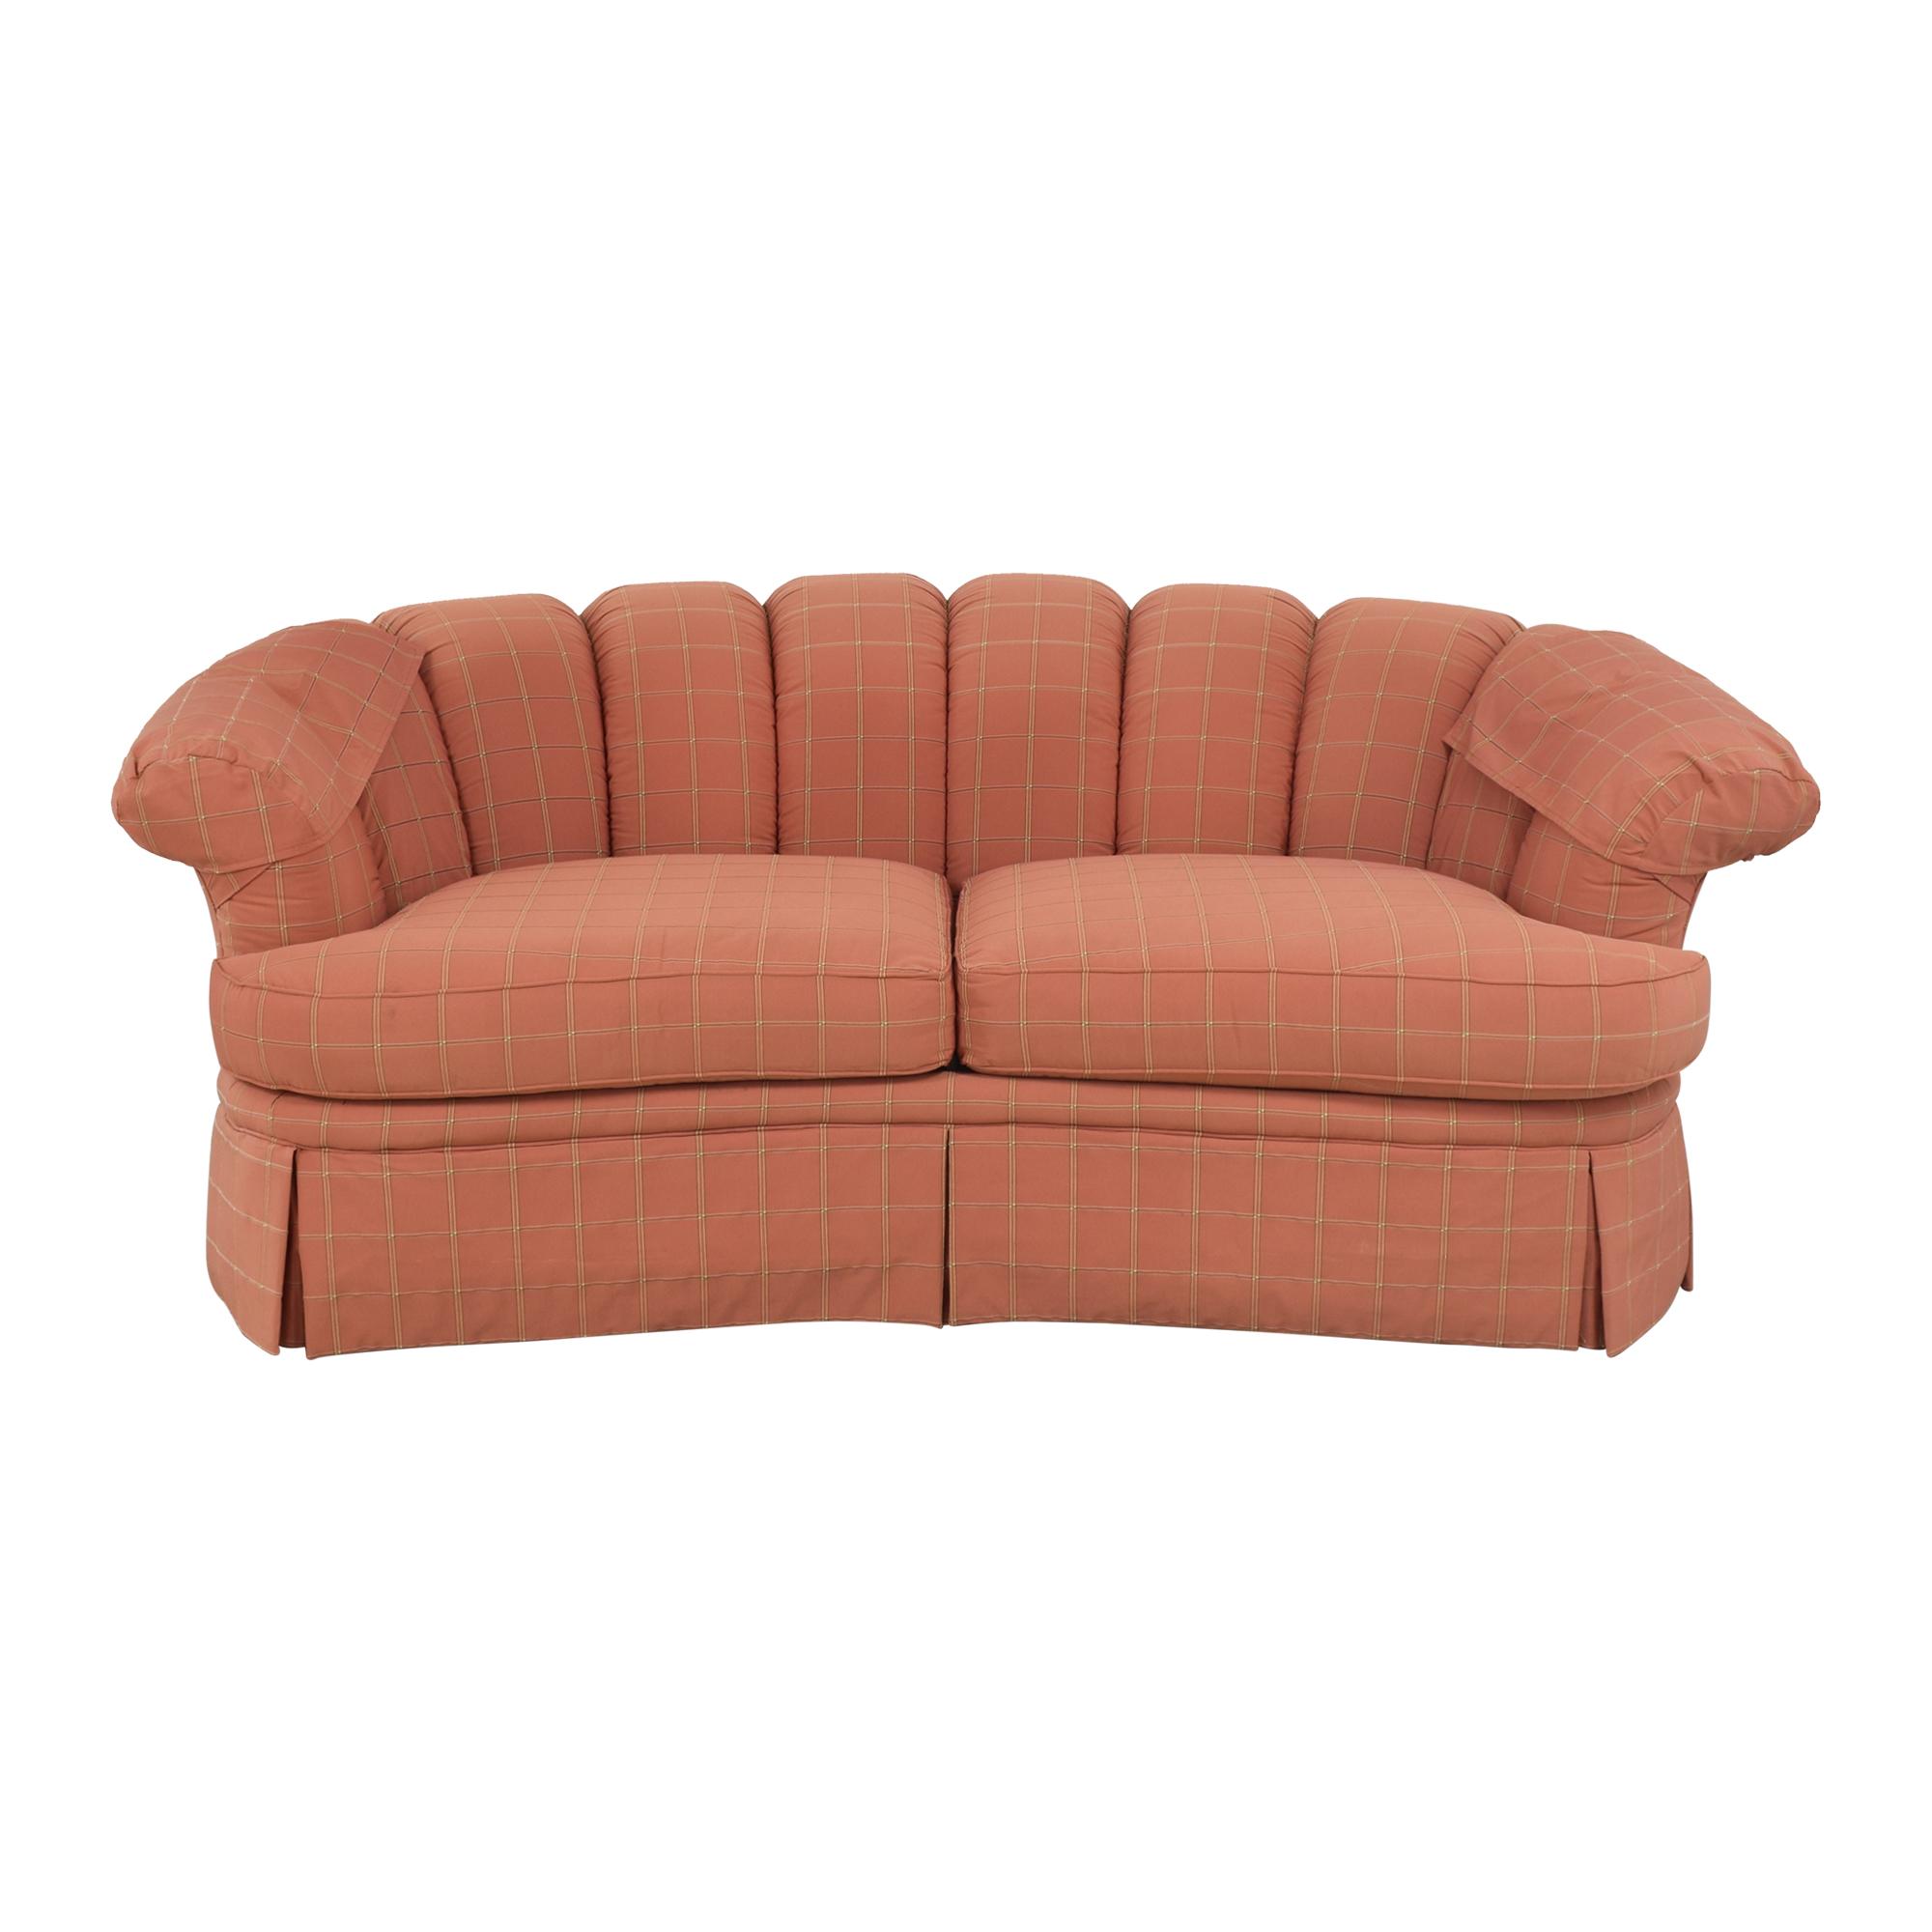 Highland House Furniture Highland House Scalloped Sofa pa